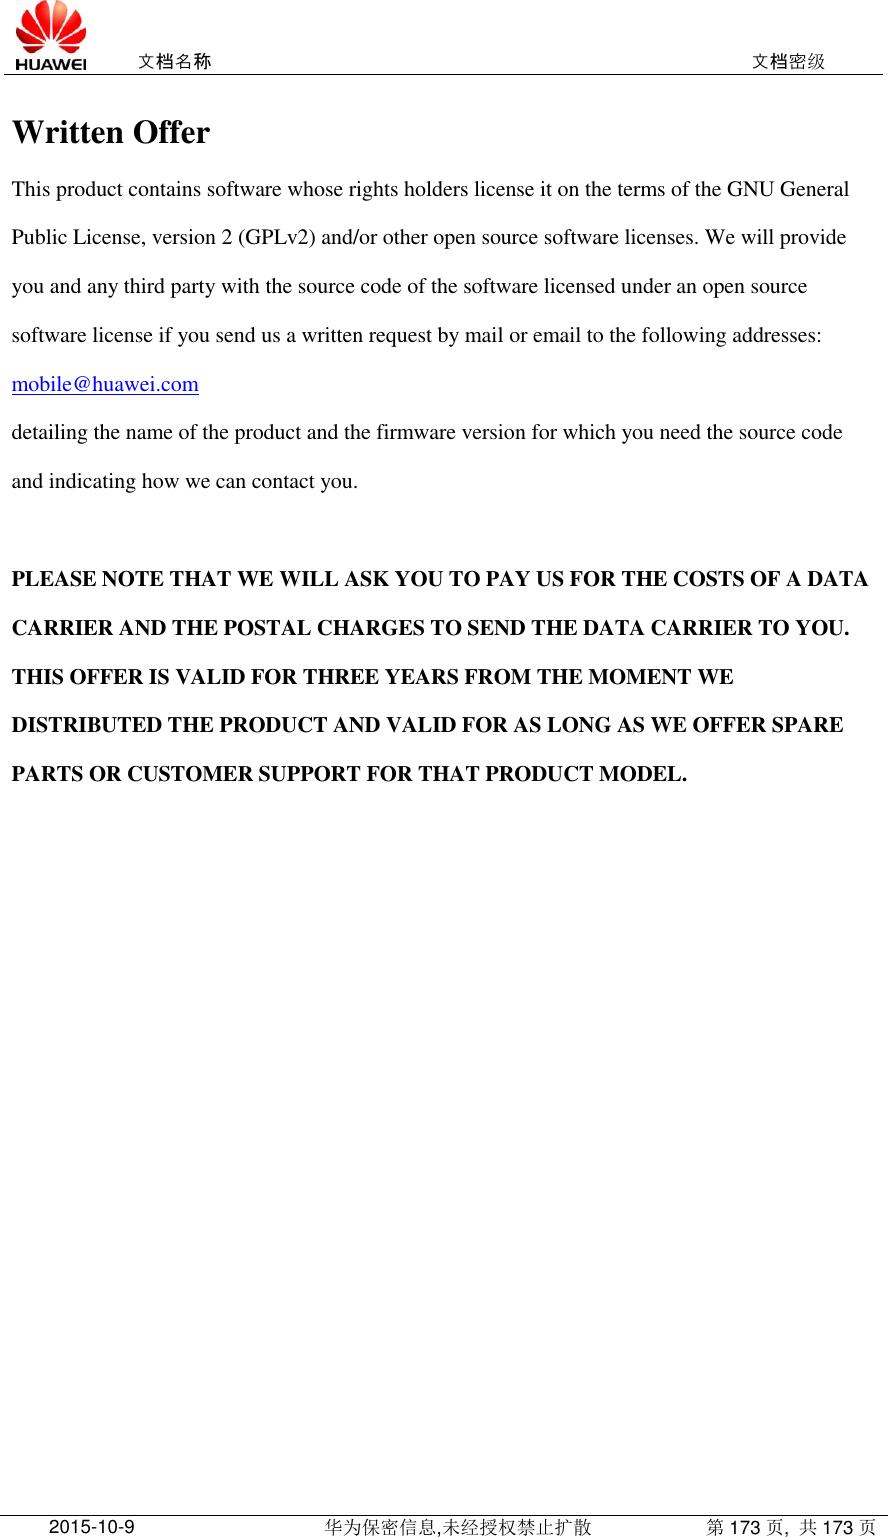 Huawei E3272E3276 OPEN SOURCE SOFTWARE NOTICE(stick)